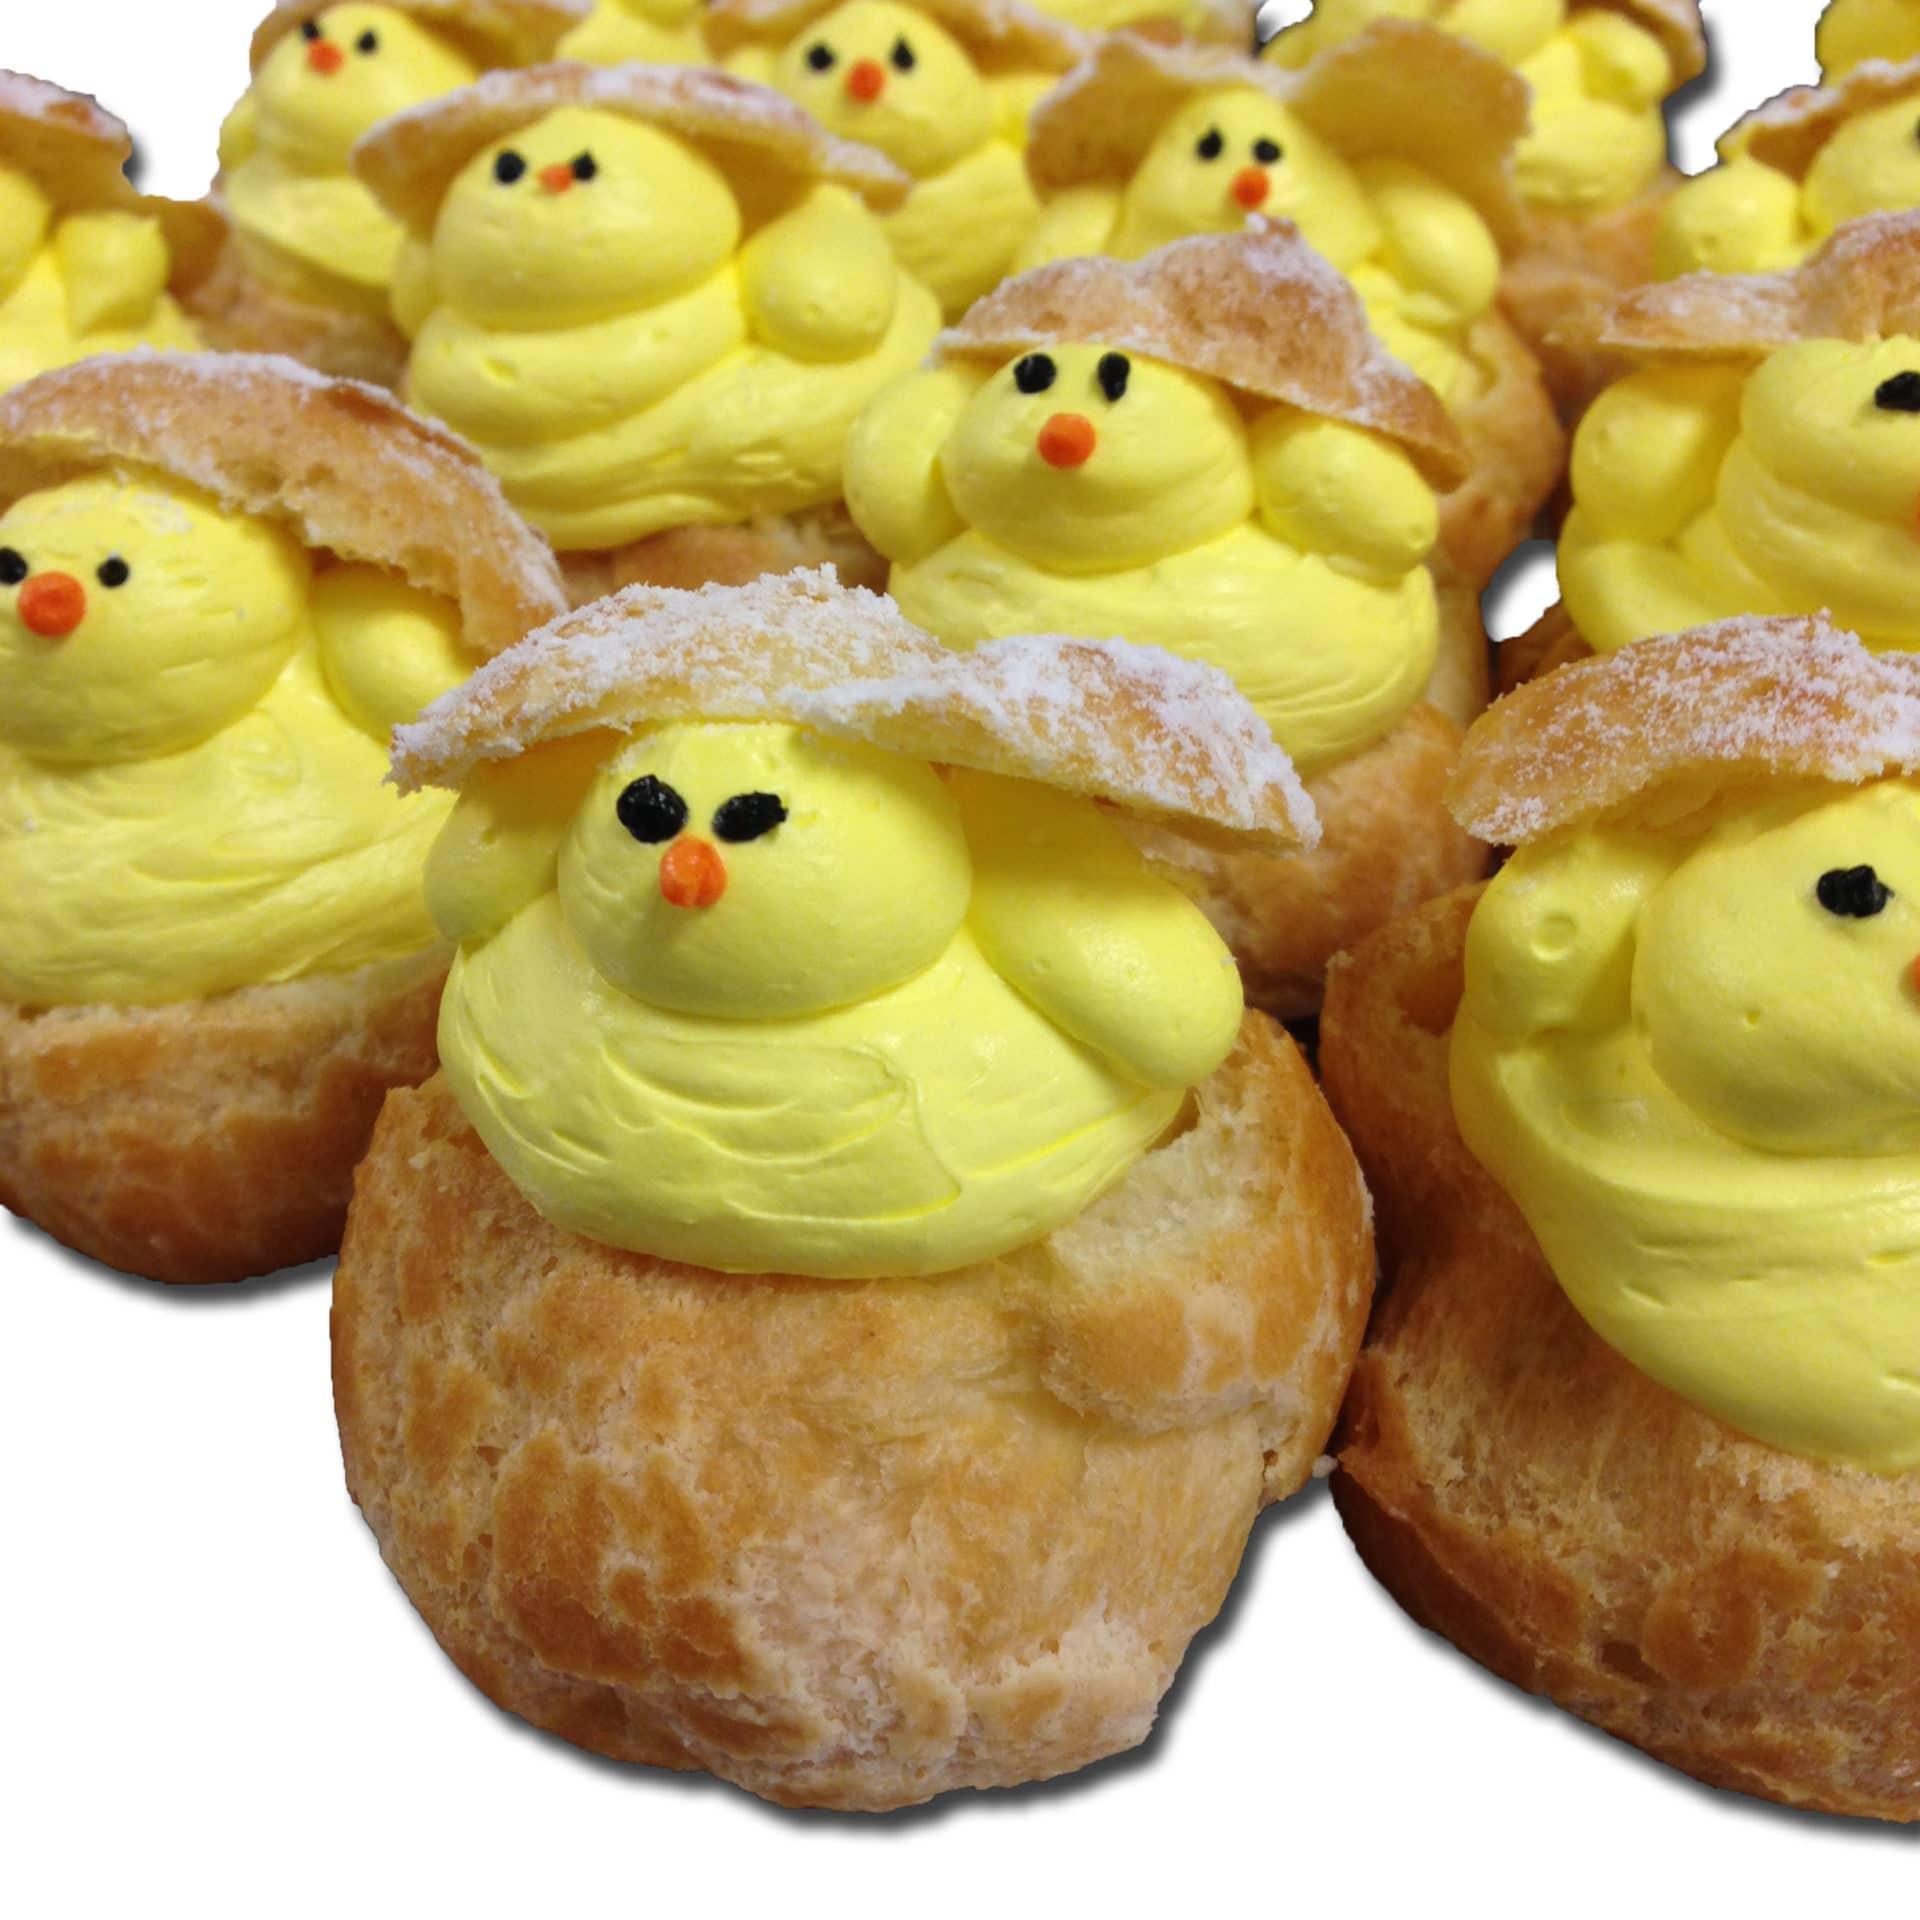 cream puff chicks mini 12 pack aggie s bakery cake shop